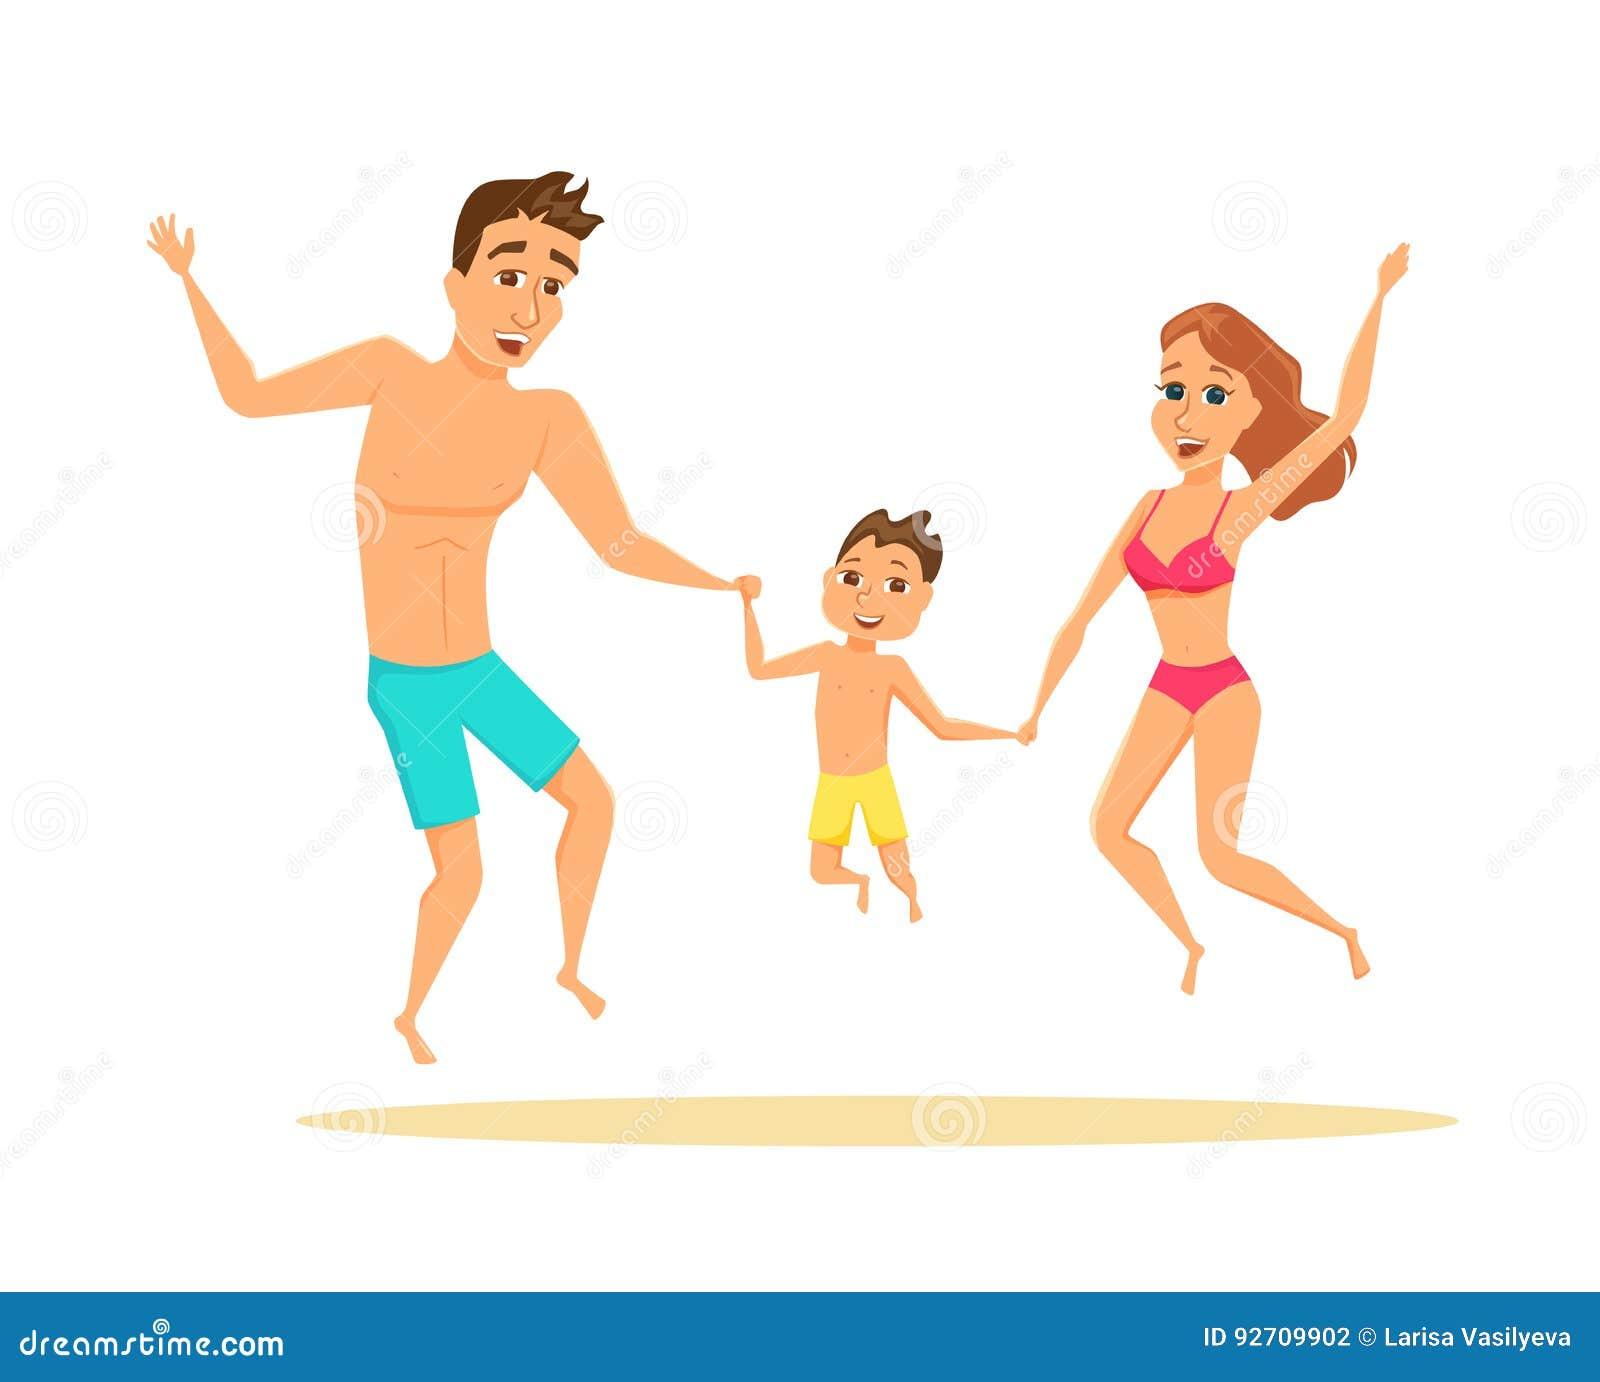 Couple Enjoying Their Summer Holidays Stock Photo: Family Jumping On The Beach Stock Vector